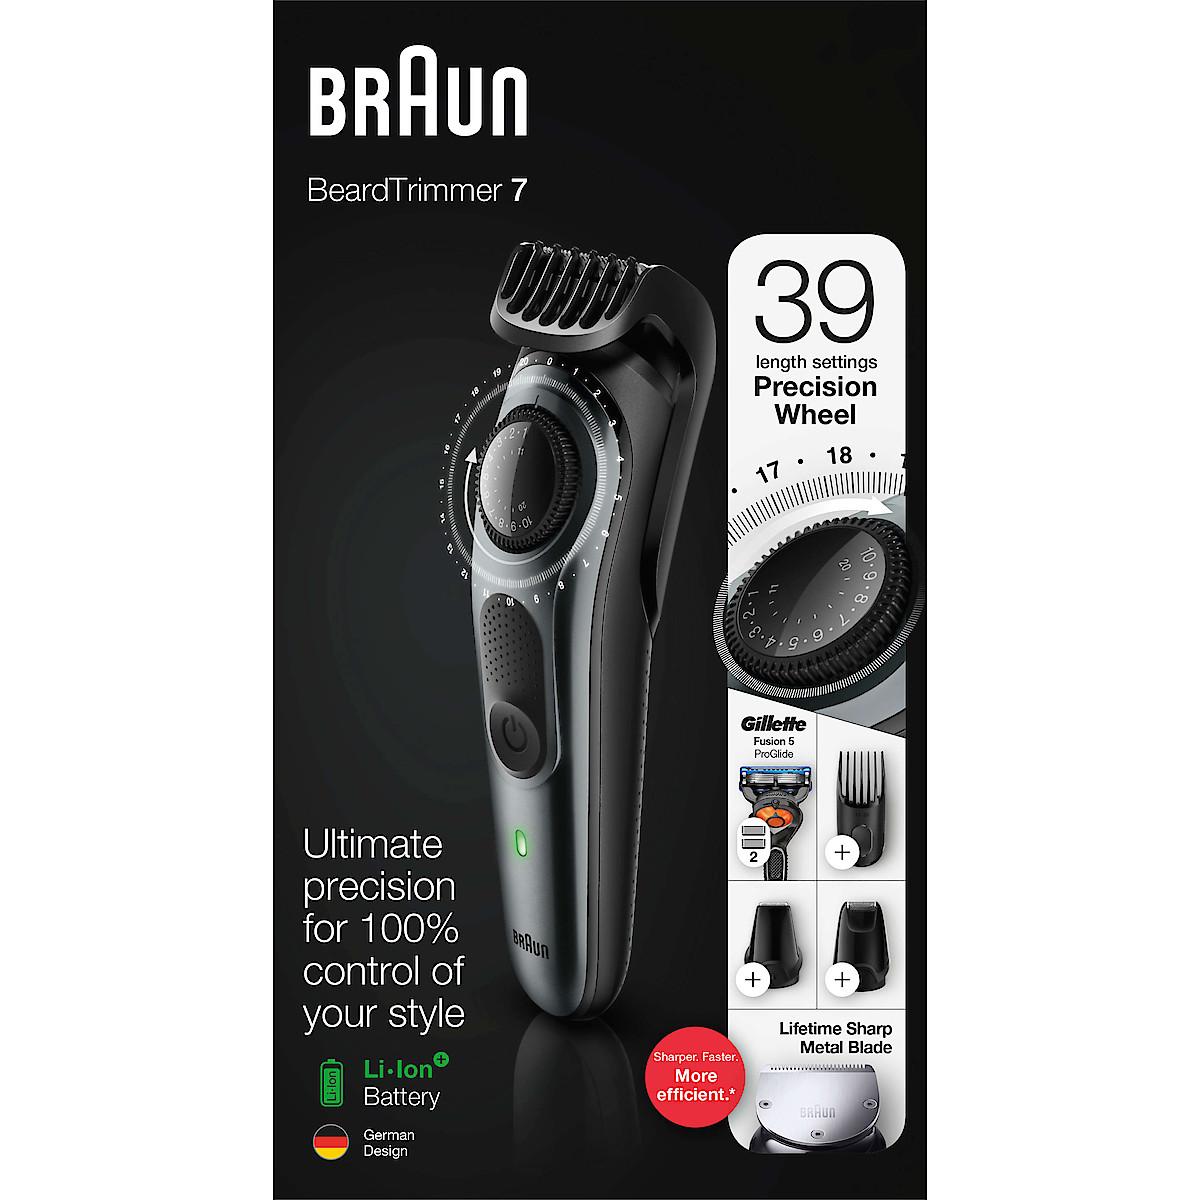 Braun BT7220, skäggtrimmer